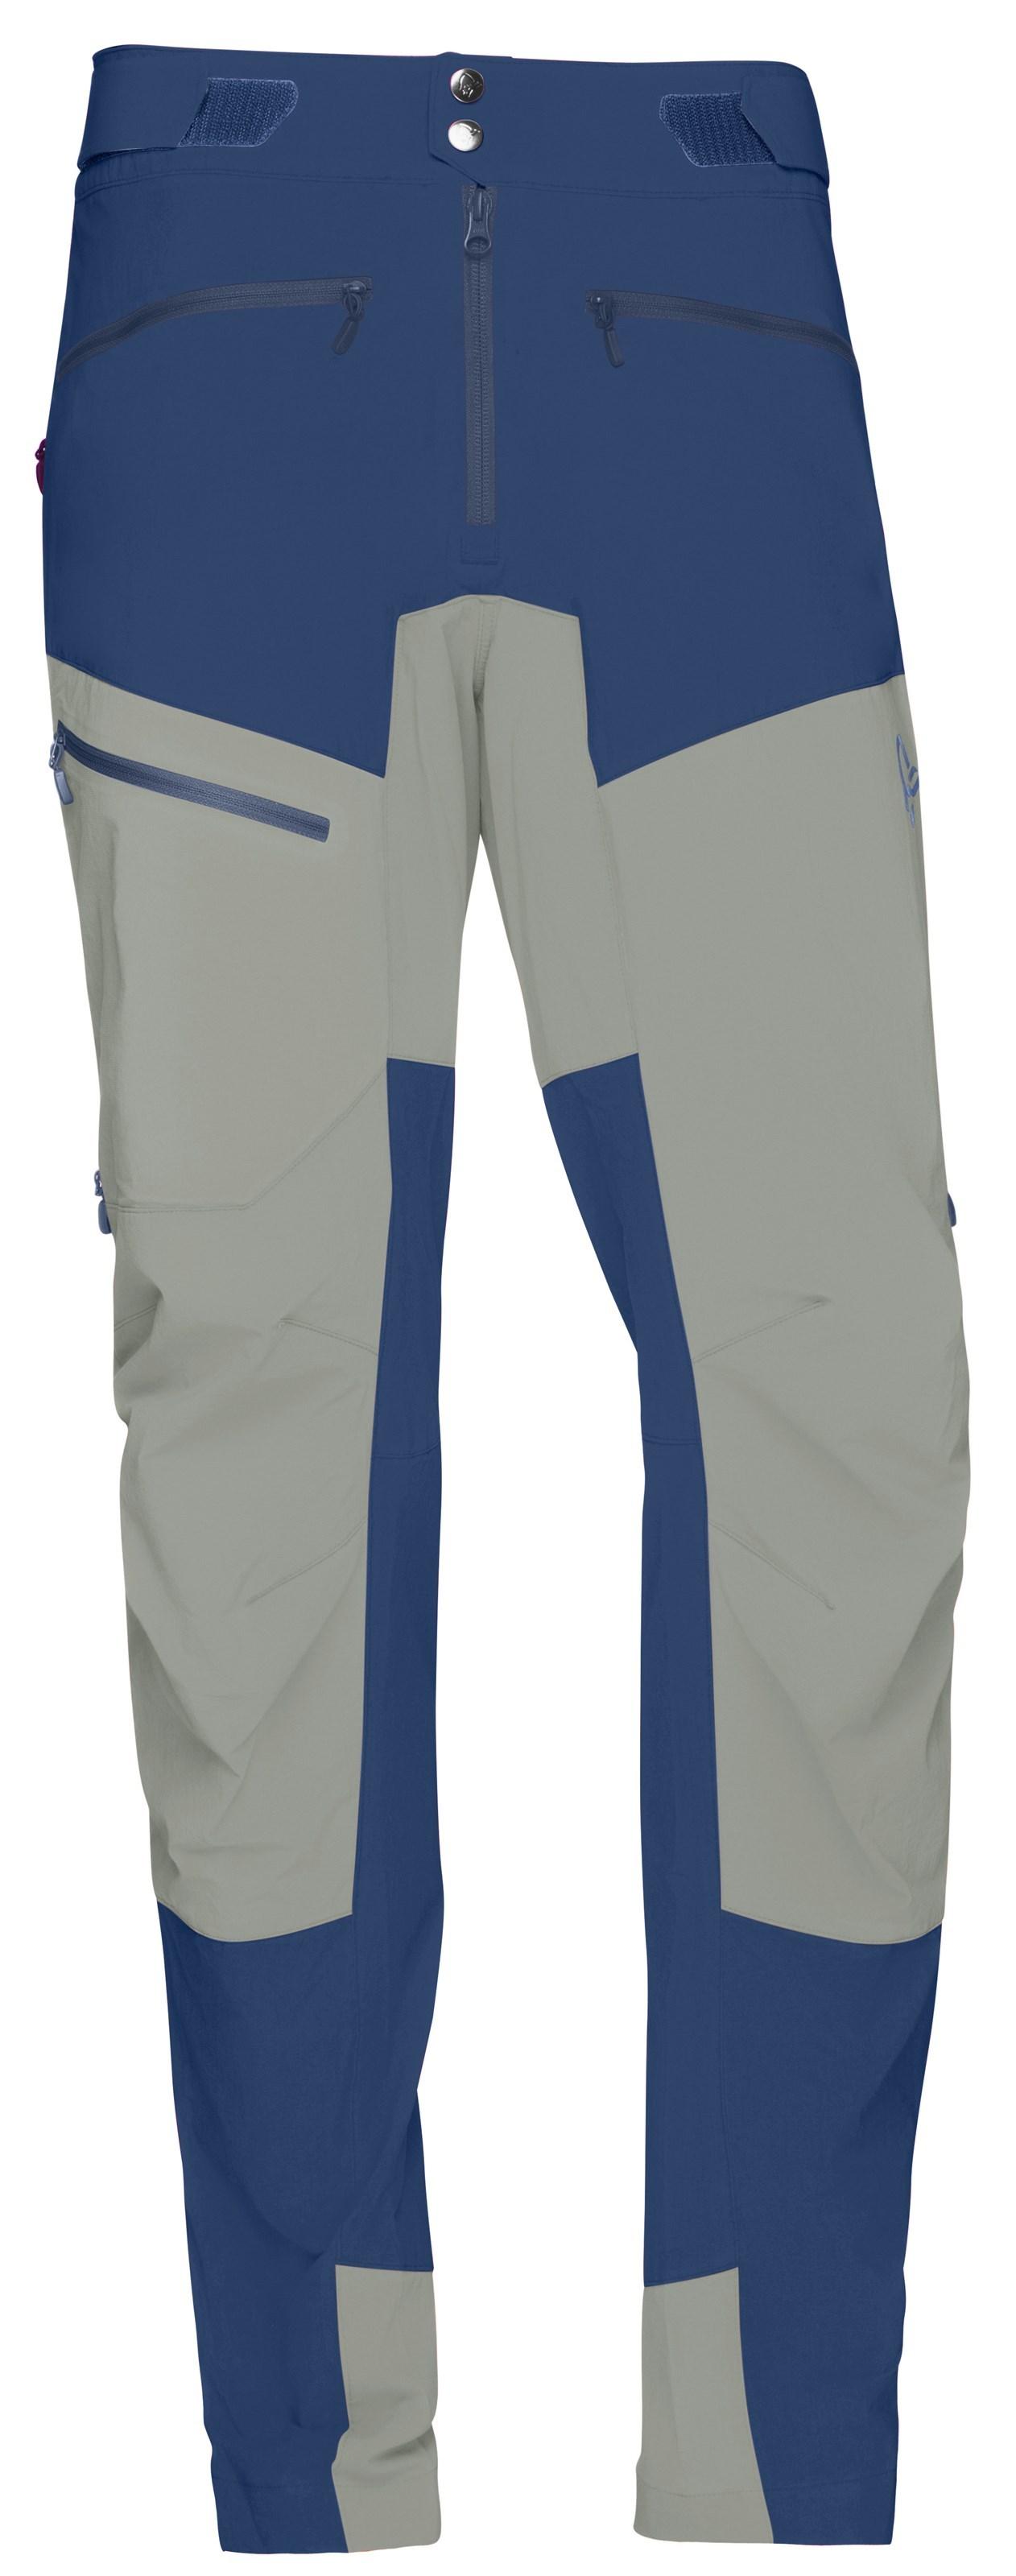 c2c077c4 ... Bilde: Norrøna Fjørå flex1 Pants, softshellbukse herre - Indigo  Night/Castor Grey 2211